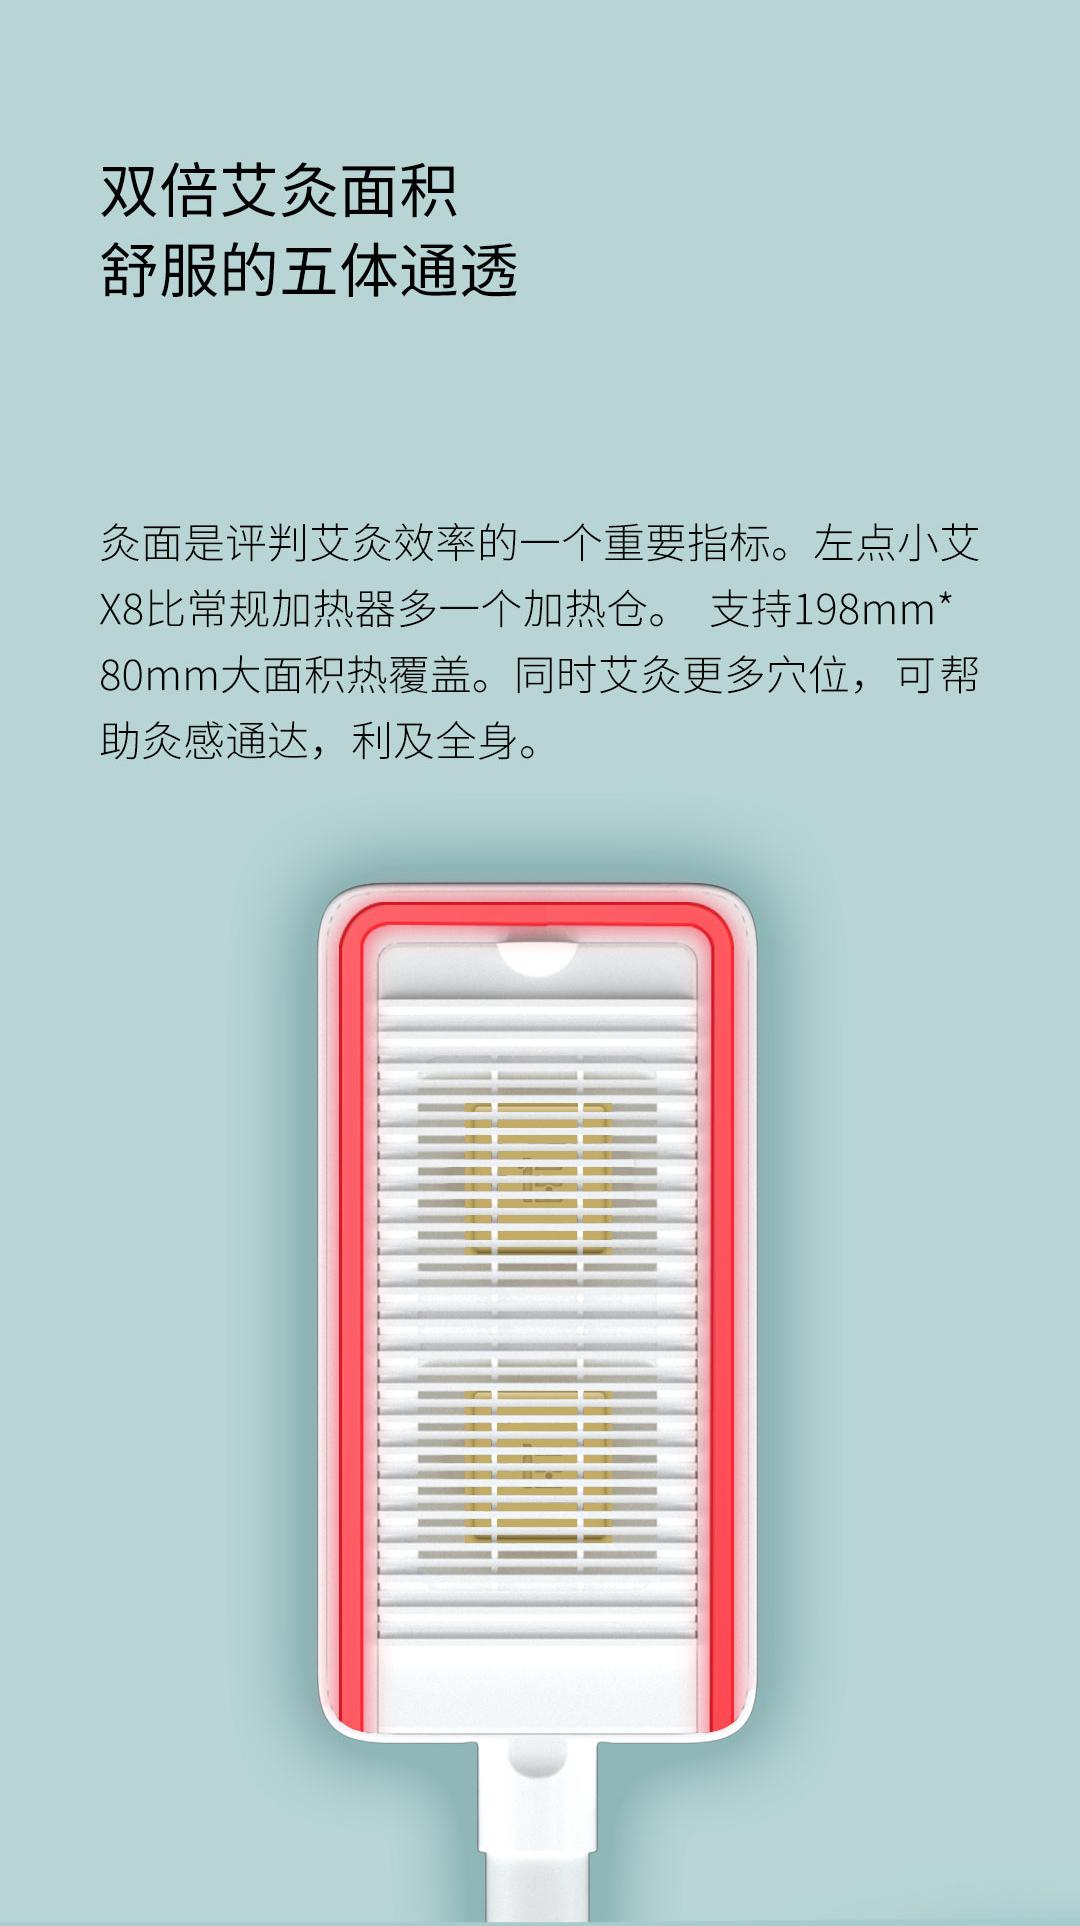 1600x_image.png?1595941094